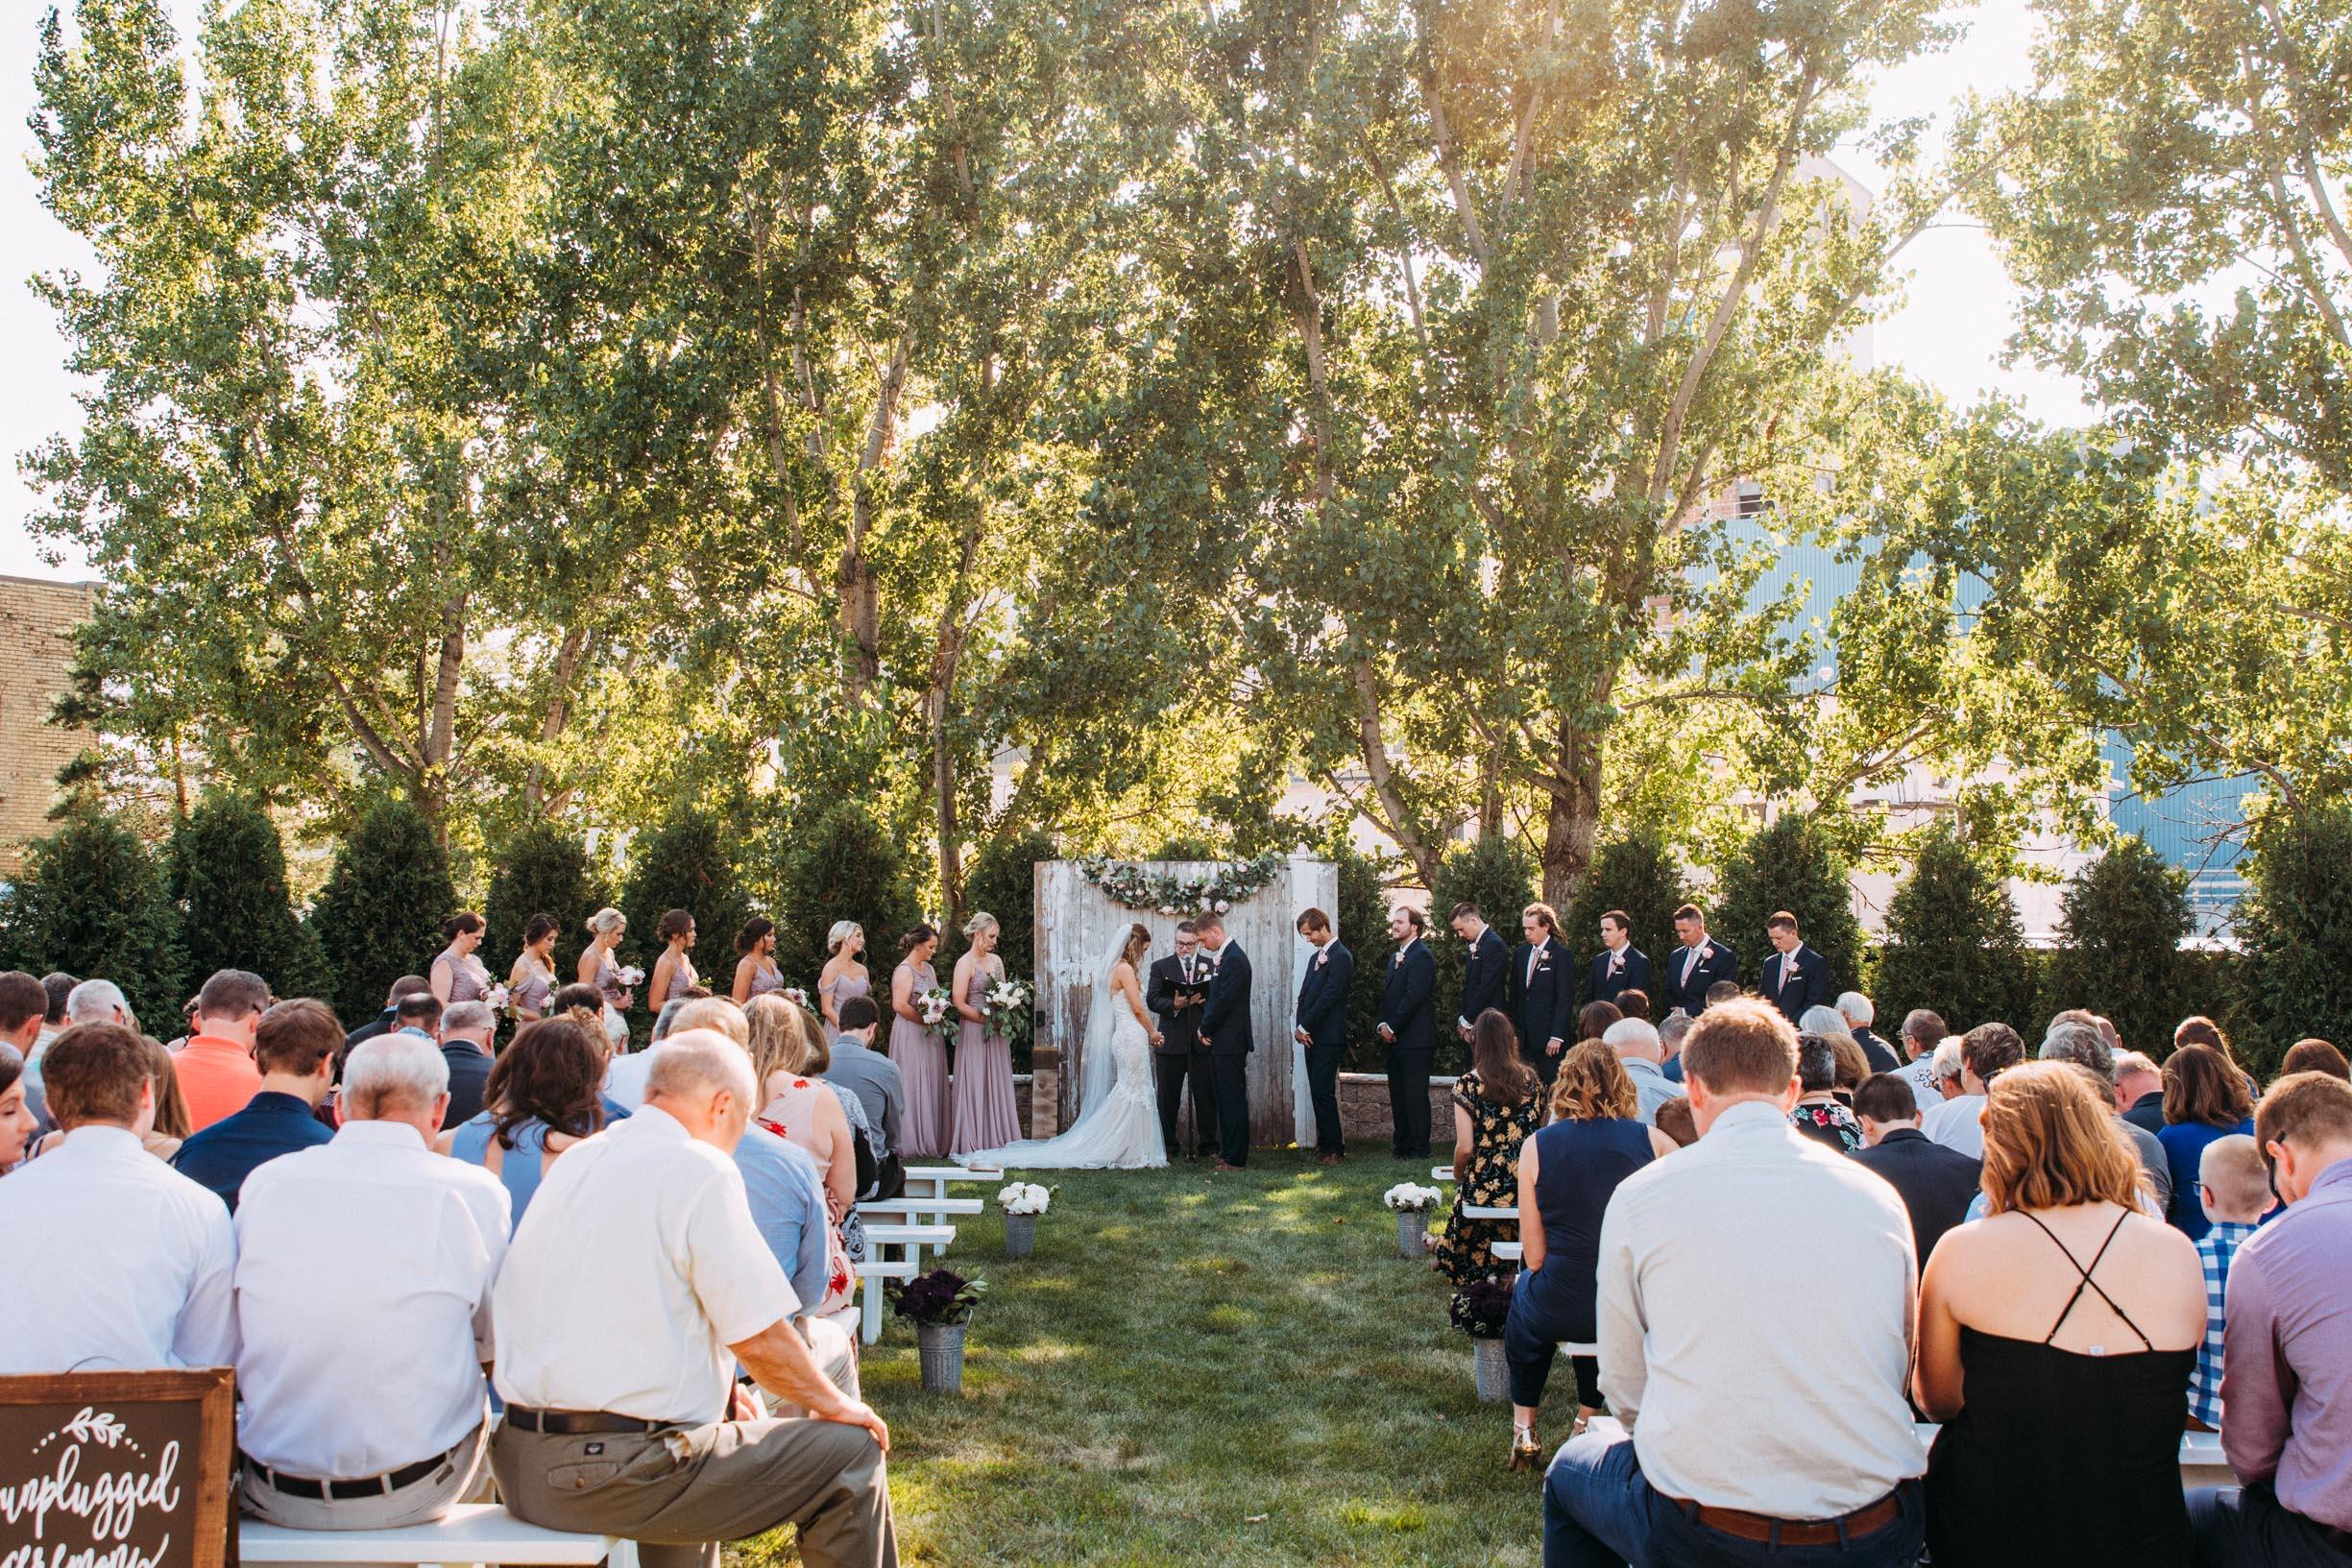 57-WeddingsattheBroz_Minnesota_WeddingBlog_Ceremony.jpg